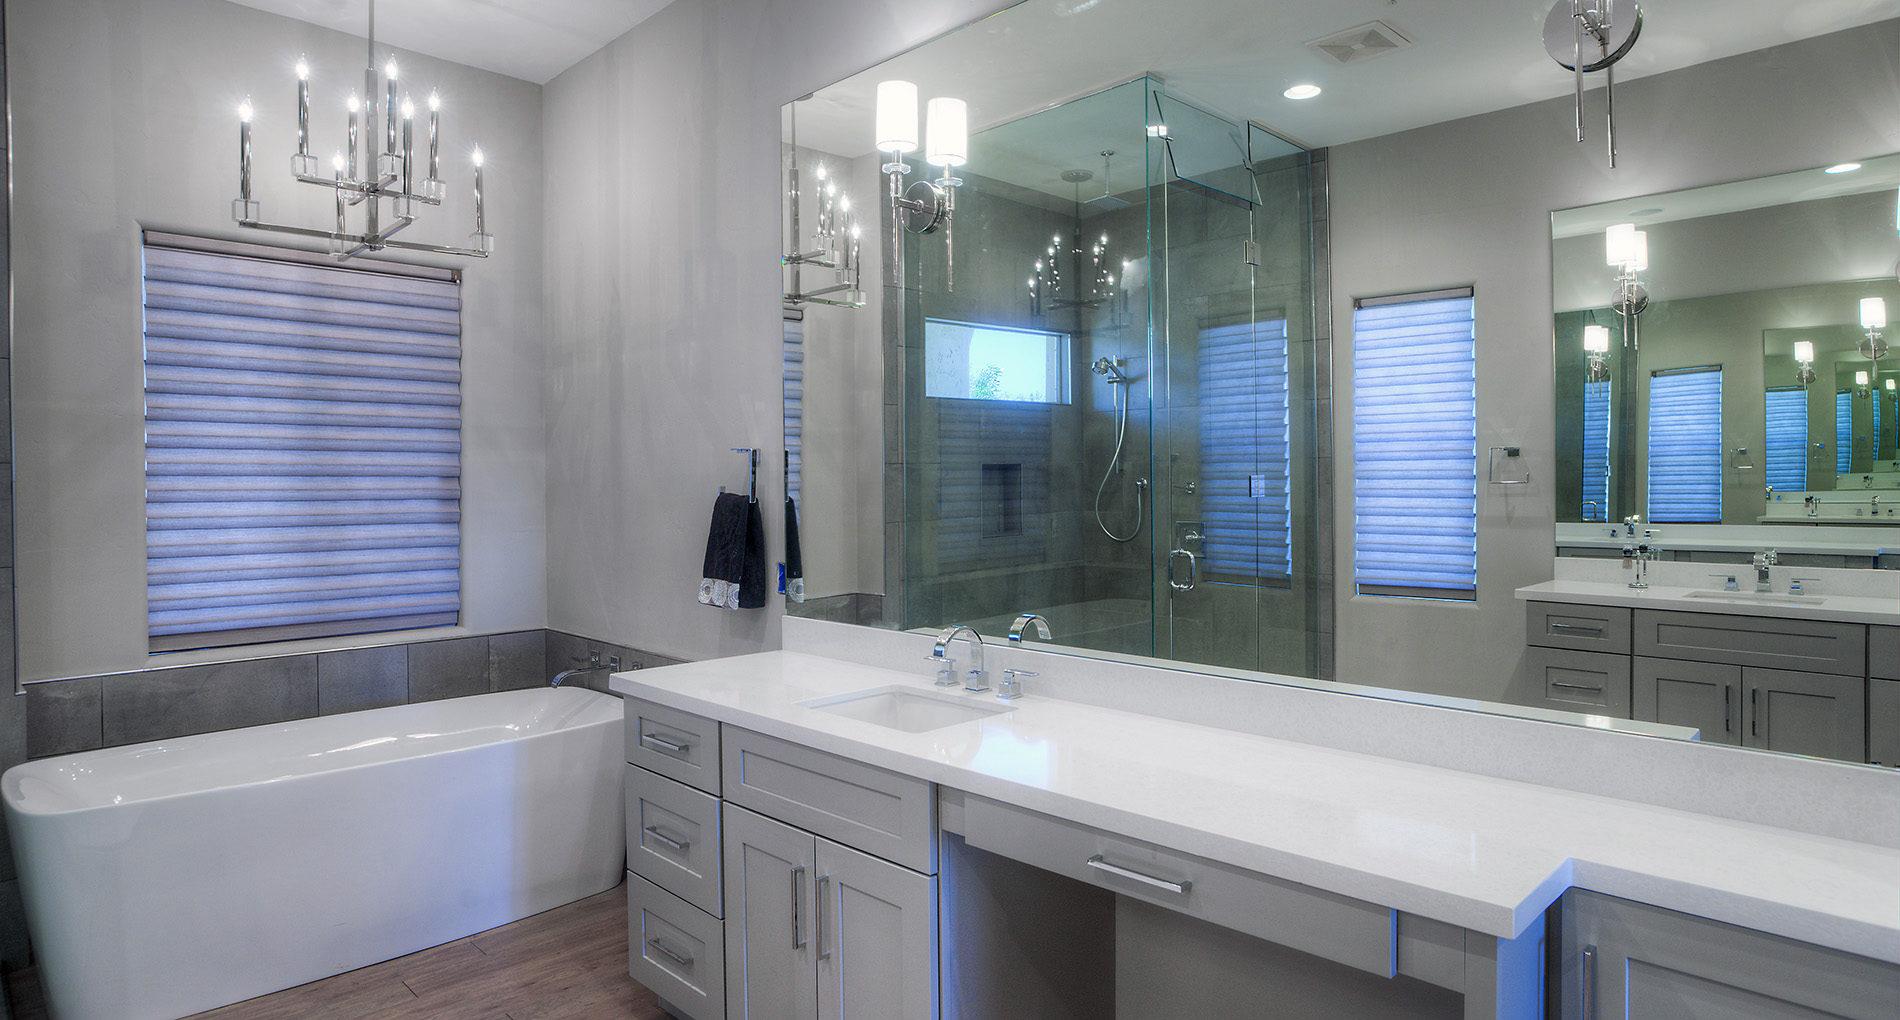 Bathroom Remodel Scottsdale Mariposagrande Slider